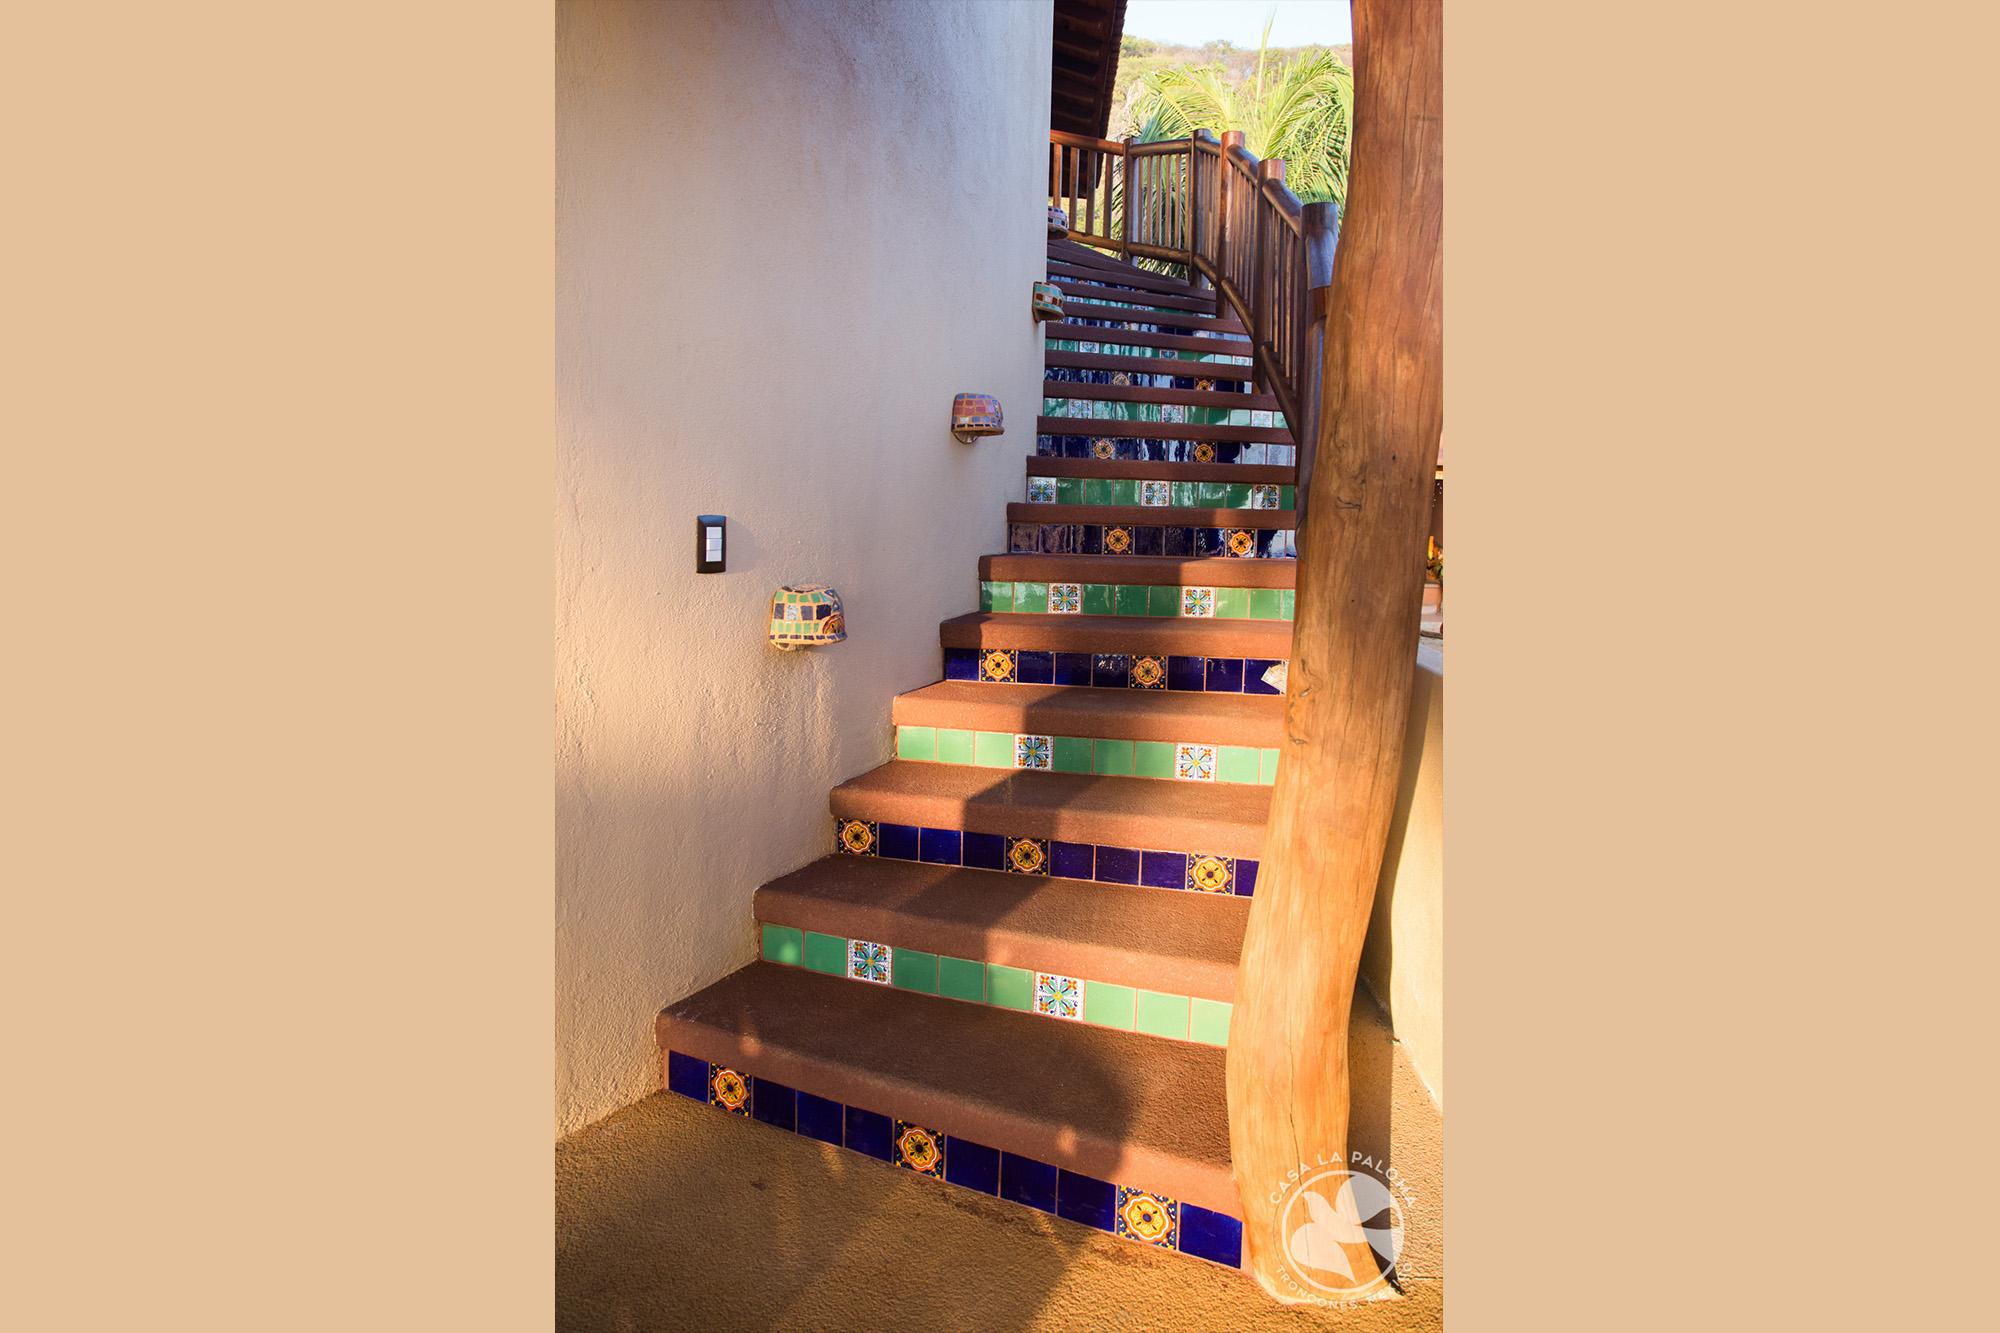 La escalera al segundo piso